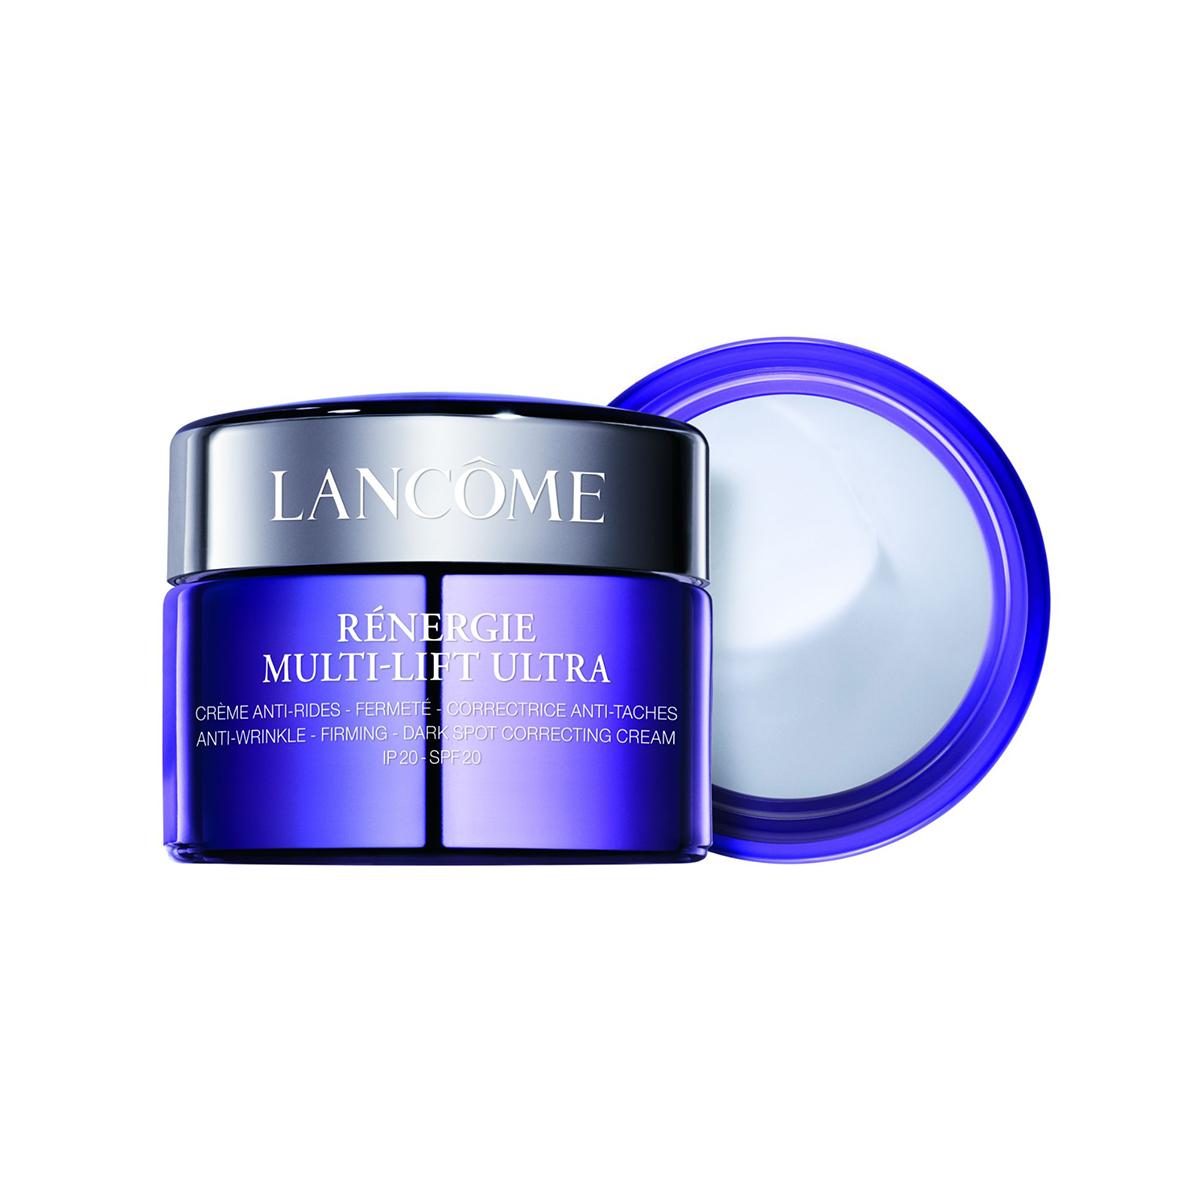 Lancome renergie multi lift ultra anti wrinkle cream 50ml